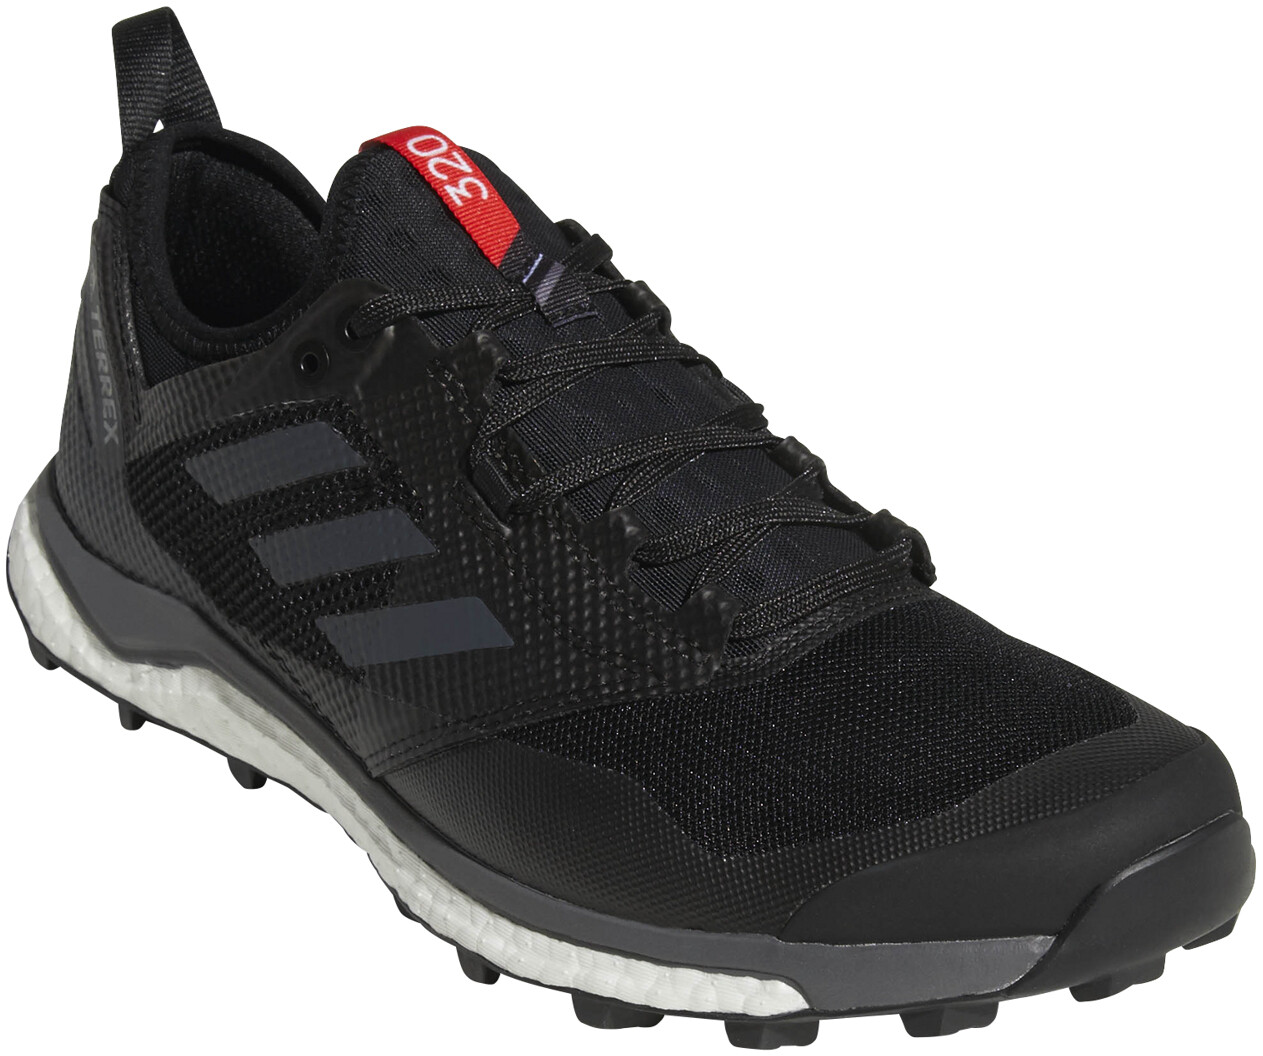 bb9e0a50a9 adidas TERREX Agravic XT Running Shoes Men black at Bikester.co.uk